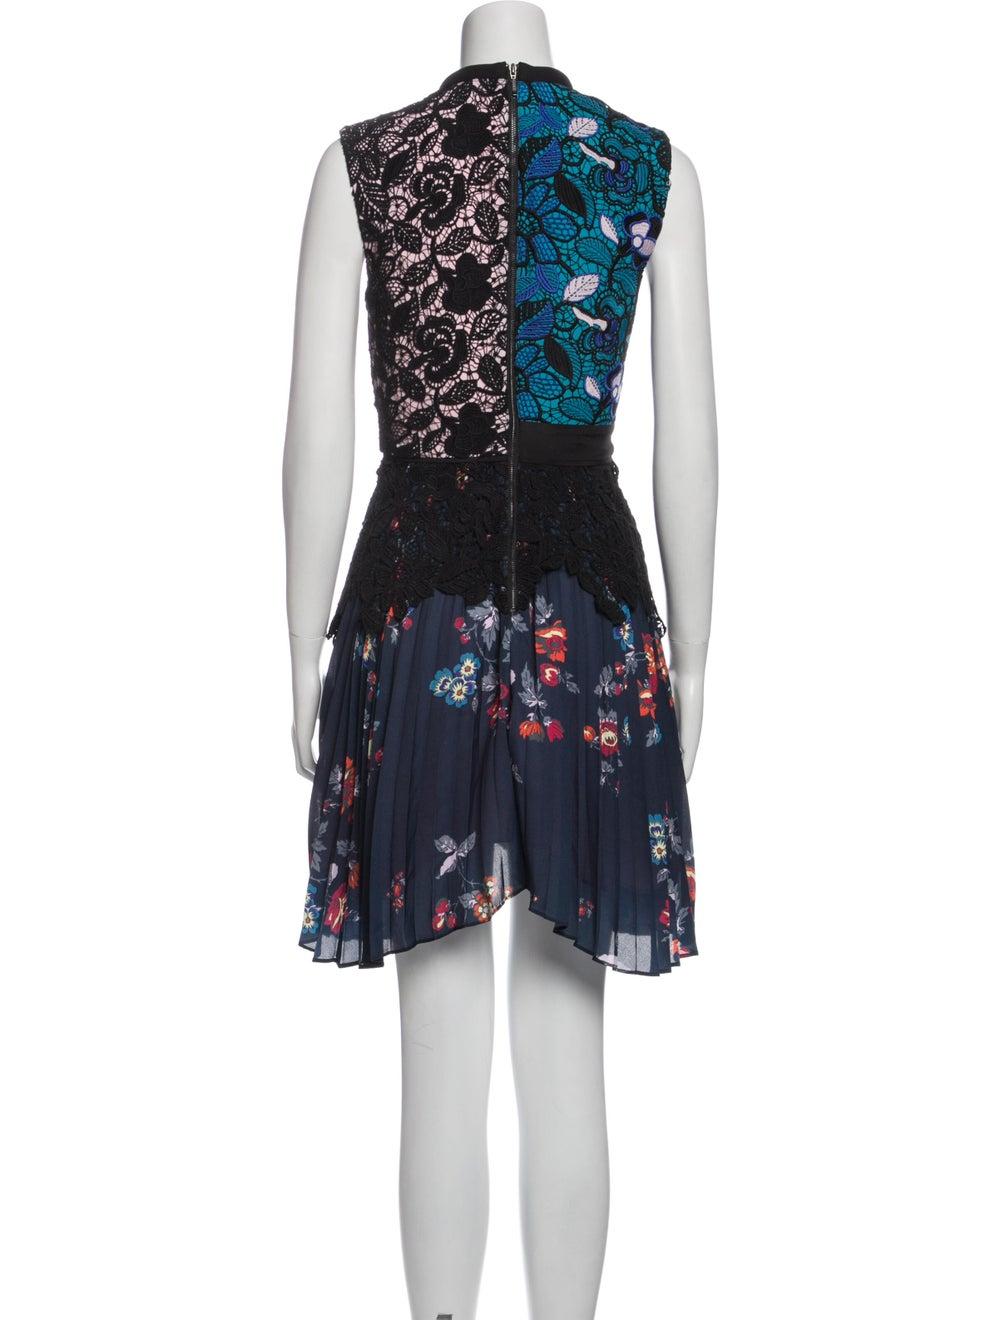 Self-Portrait Lace Pattern Knee-Length Dress Black - image 3